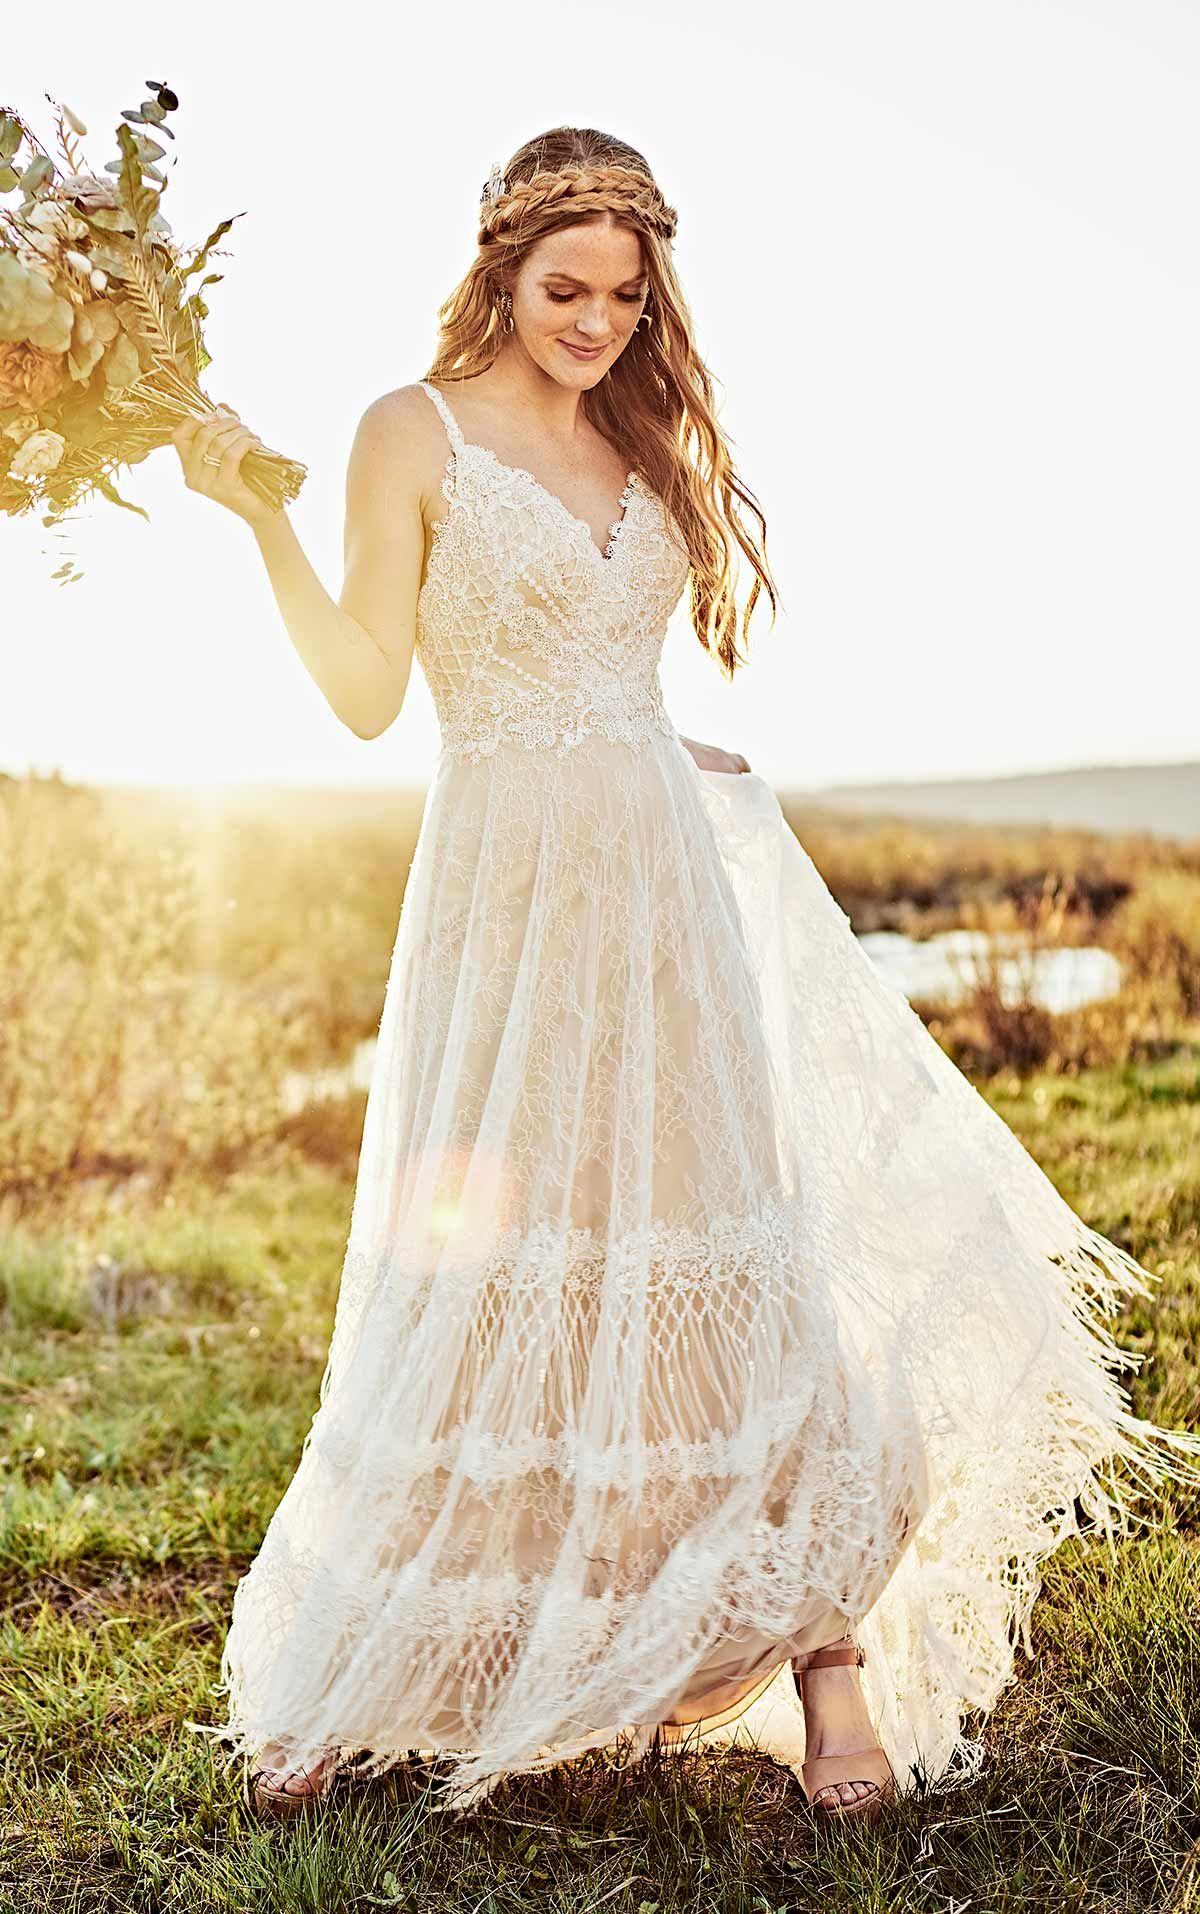 Rustic Boho Wedding Dress with Fringe Details in 2020